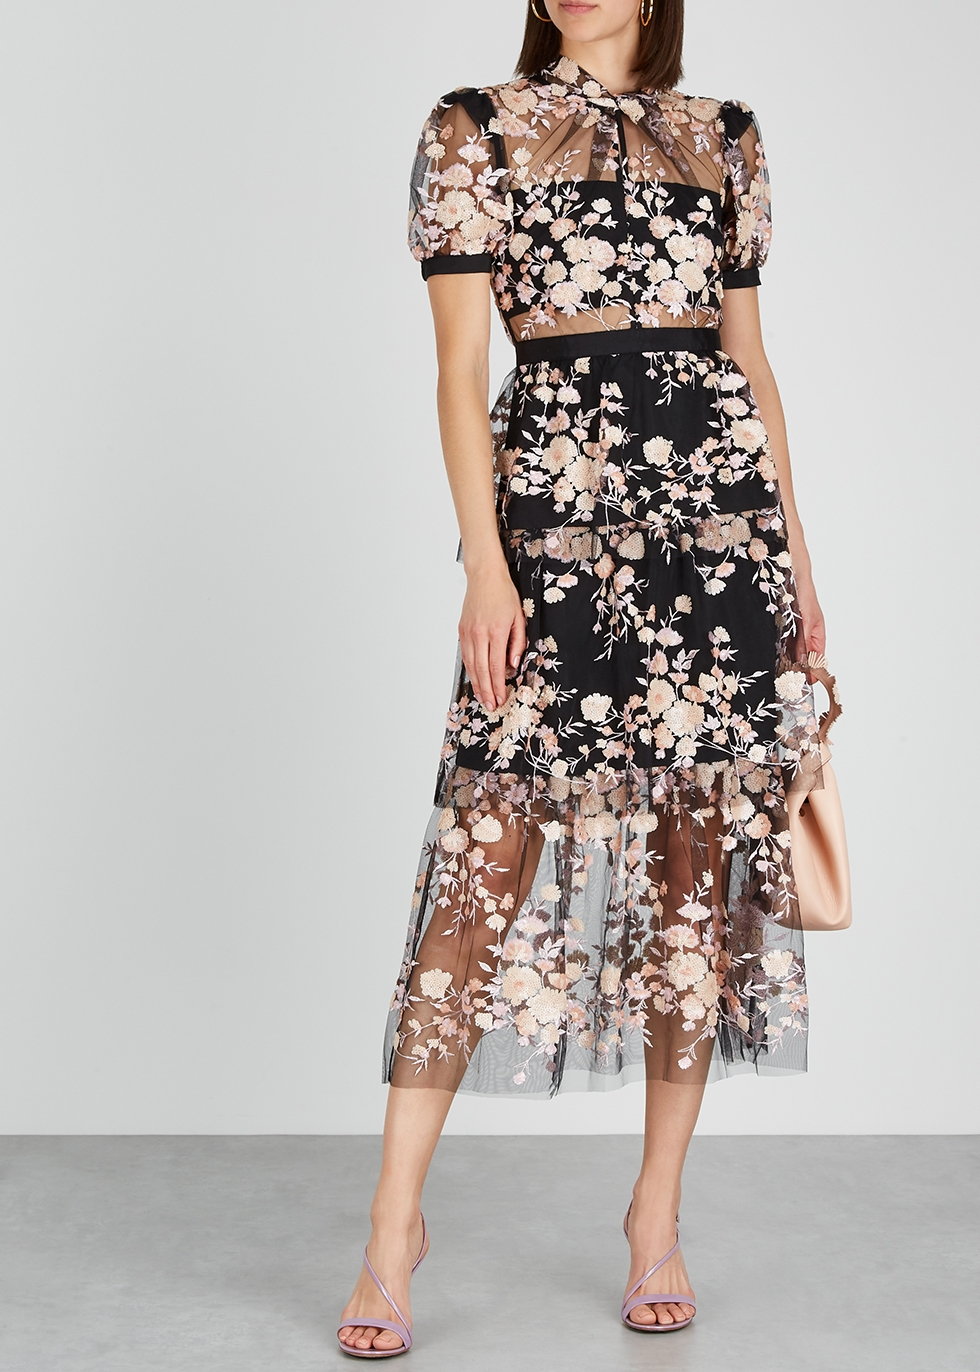 a6e63b70feea Self-Portrait White floral guipure lace midi dress - Harvey Nichols